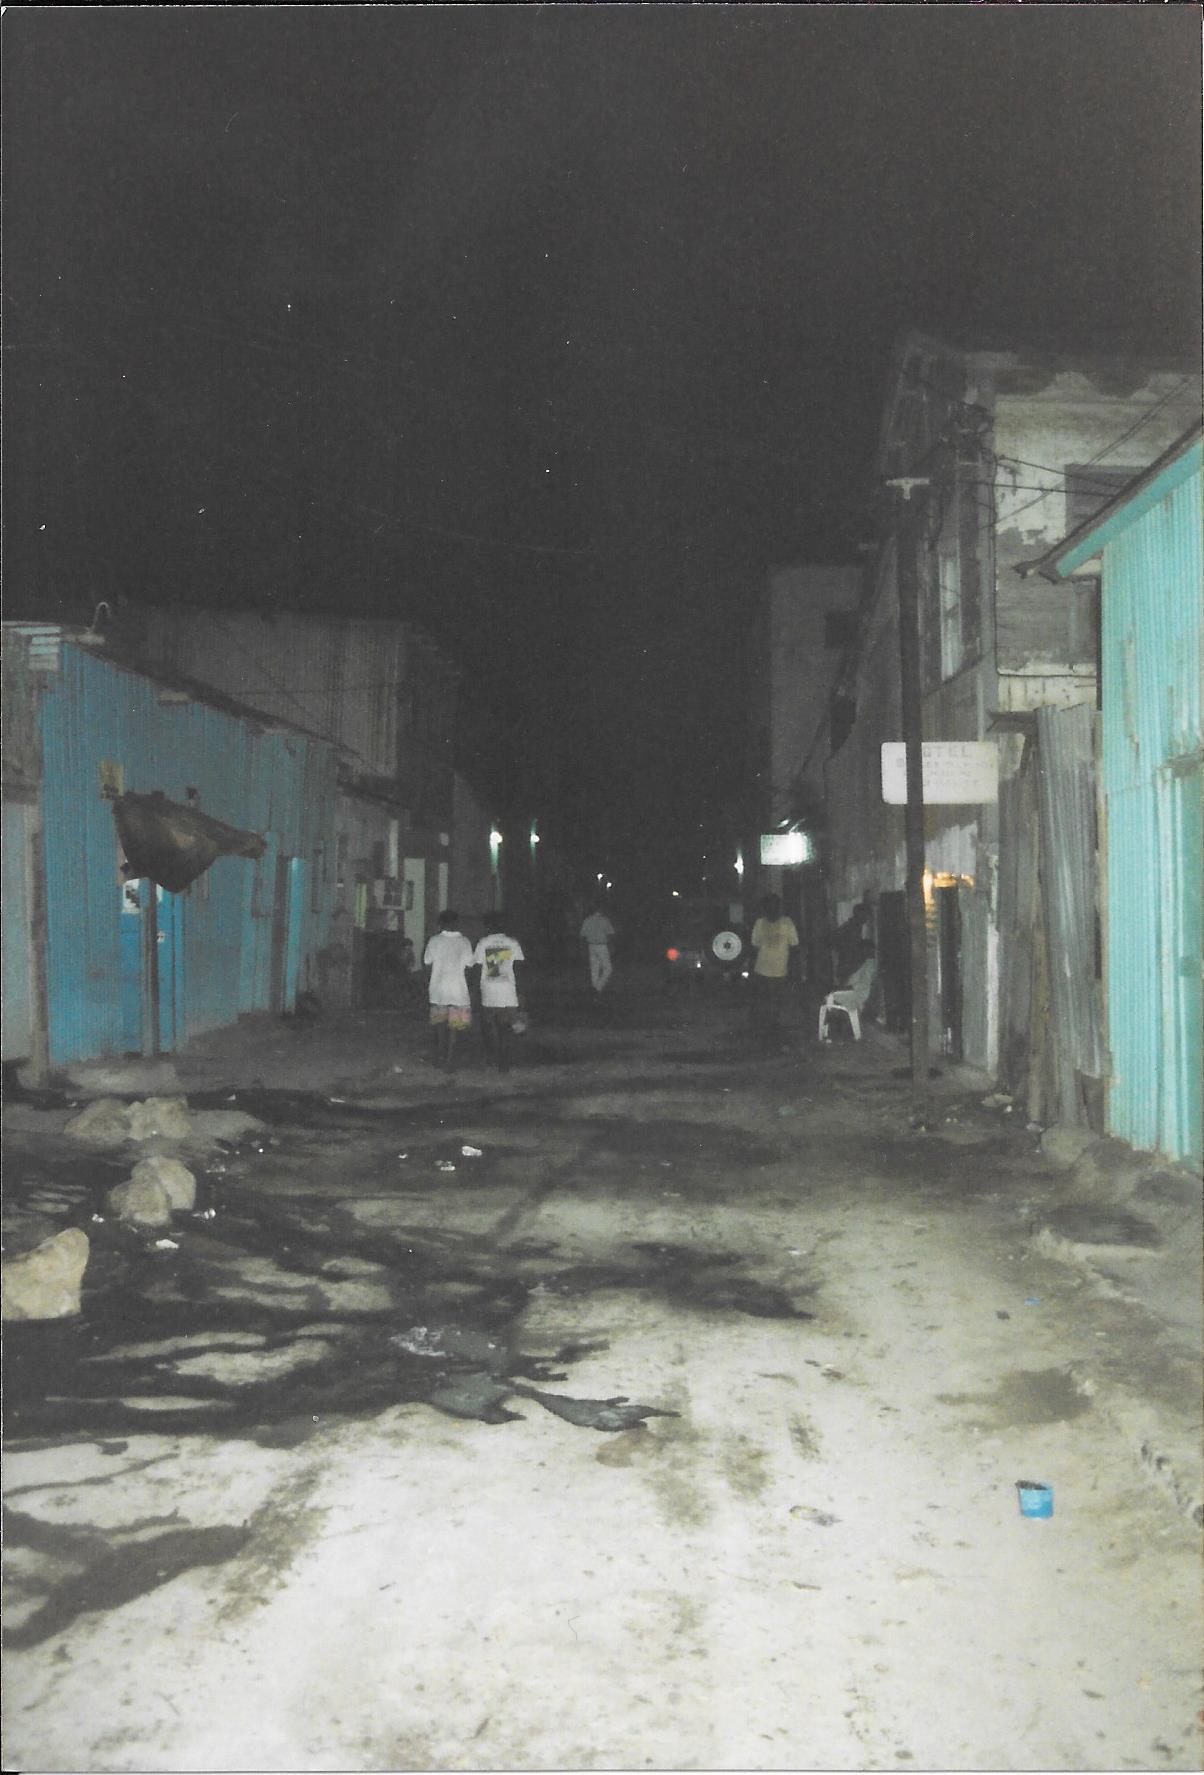 [Campagne] DJIBOUTI - TOME 1 - Page 21 311